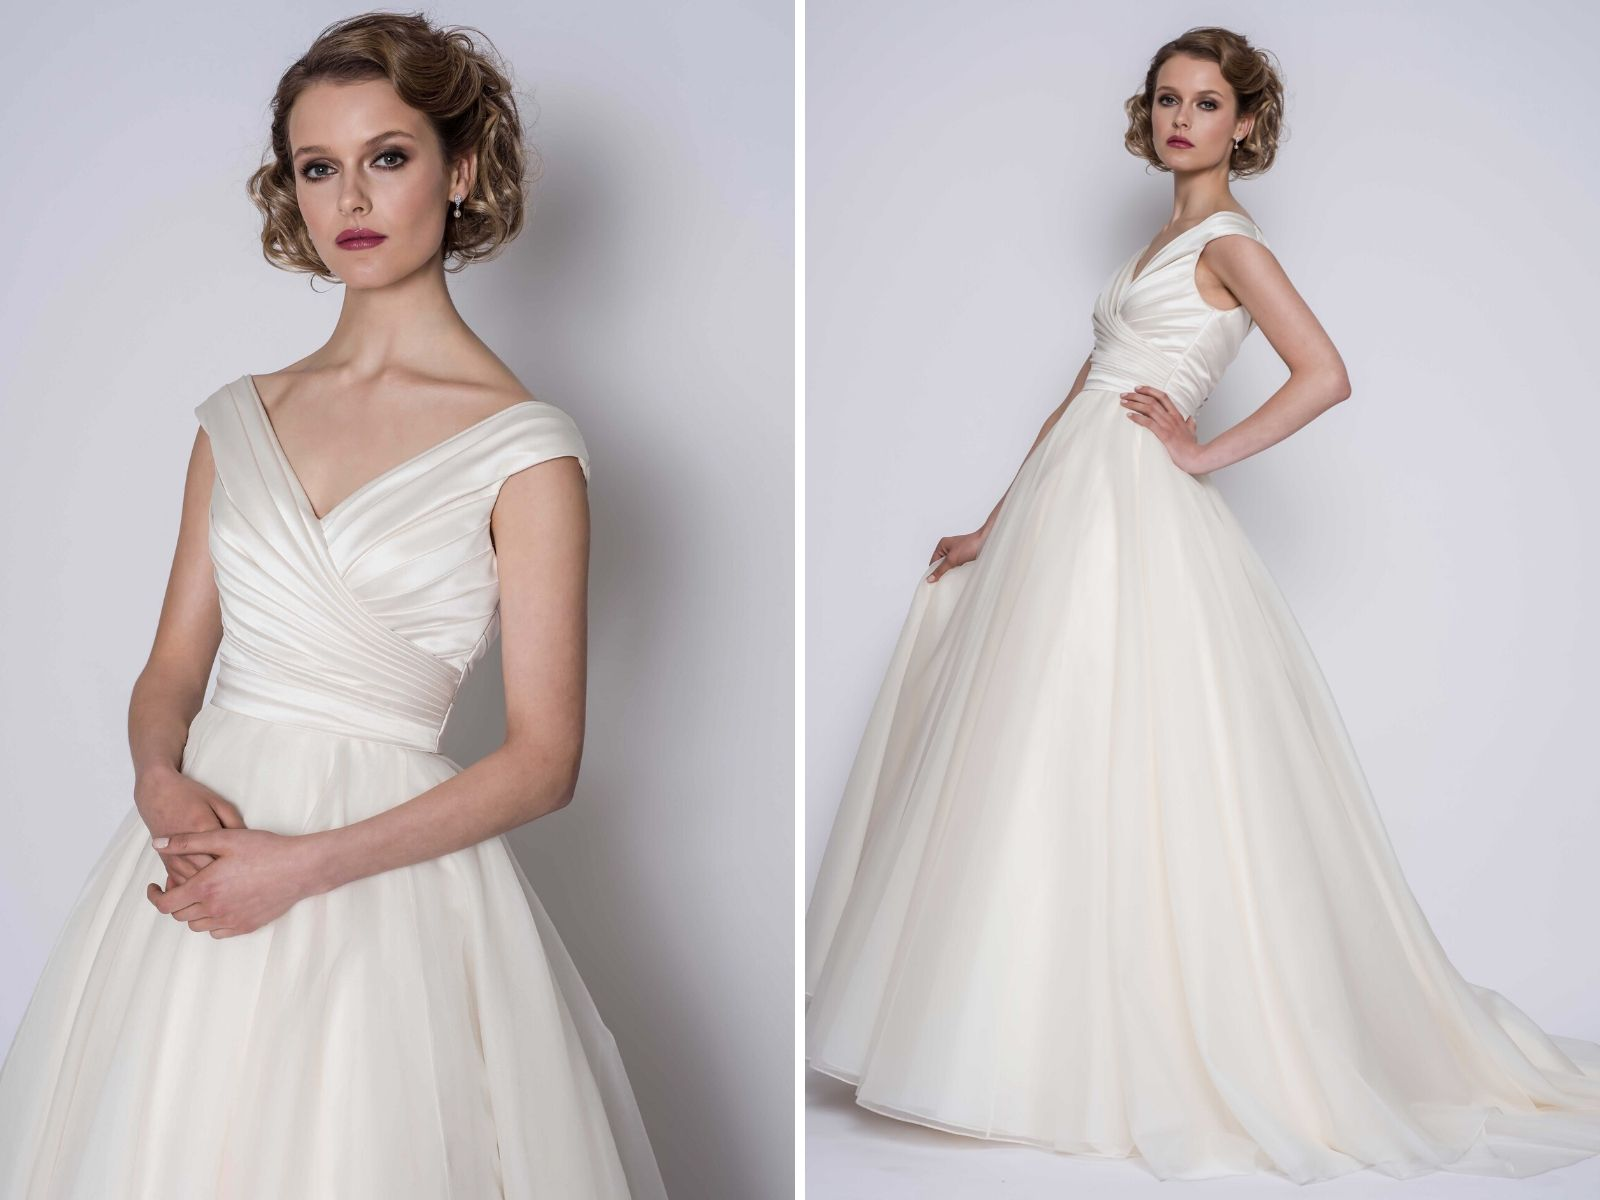 Statement wedding dress by Loulou Bridal